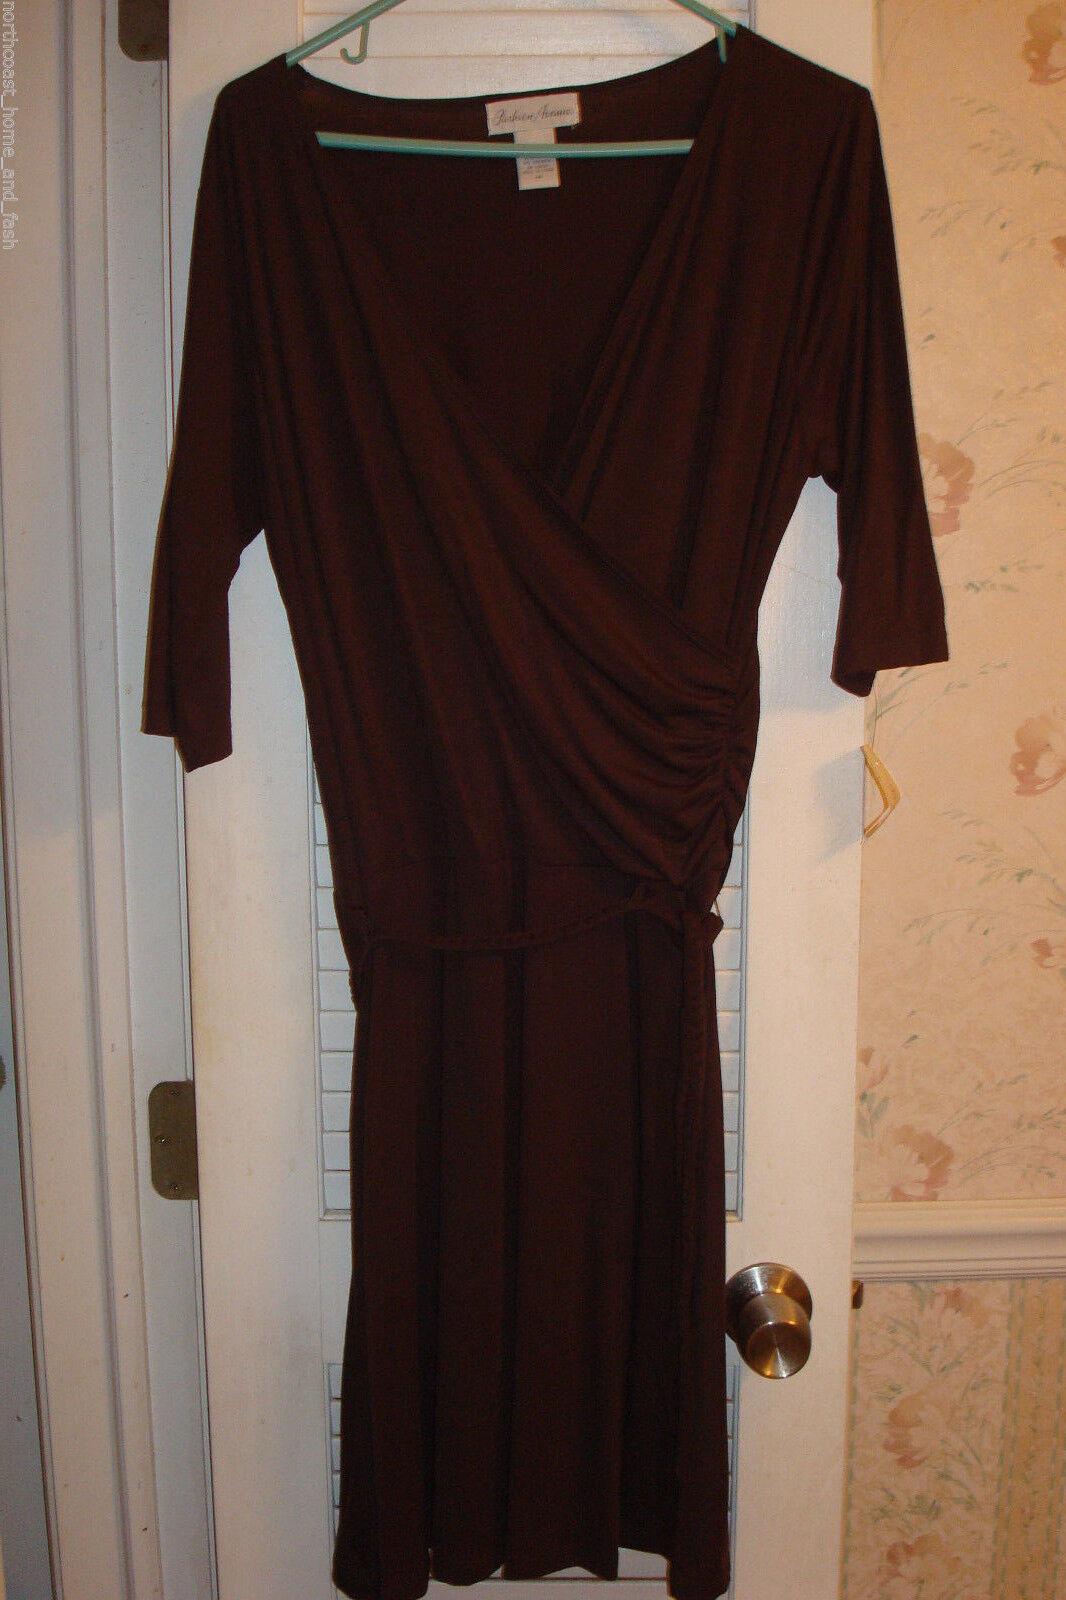 Fashion Avenue Medium Size 8 - 10 Brown Wrap Dress 3 4 Sleeves  NWT